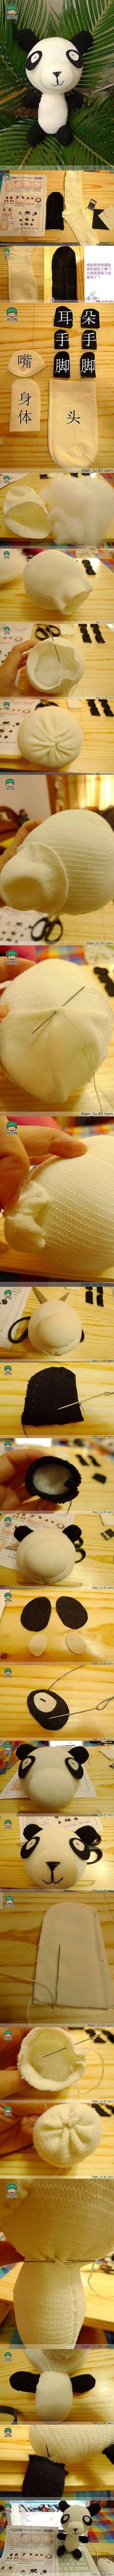 DIY Sock Panda Doll DIY Sock Panda Doll by diyforever